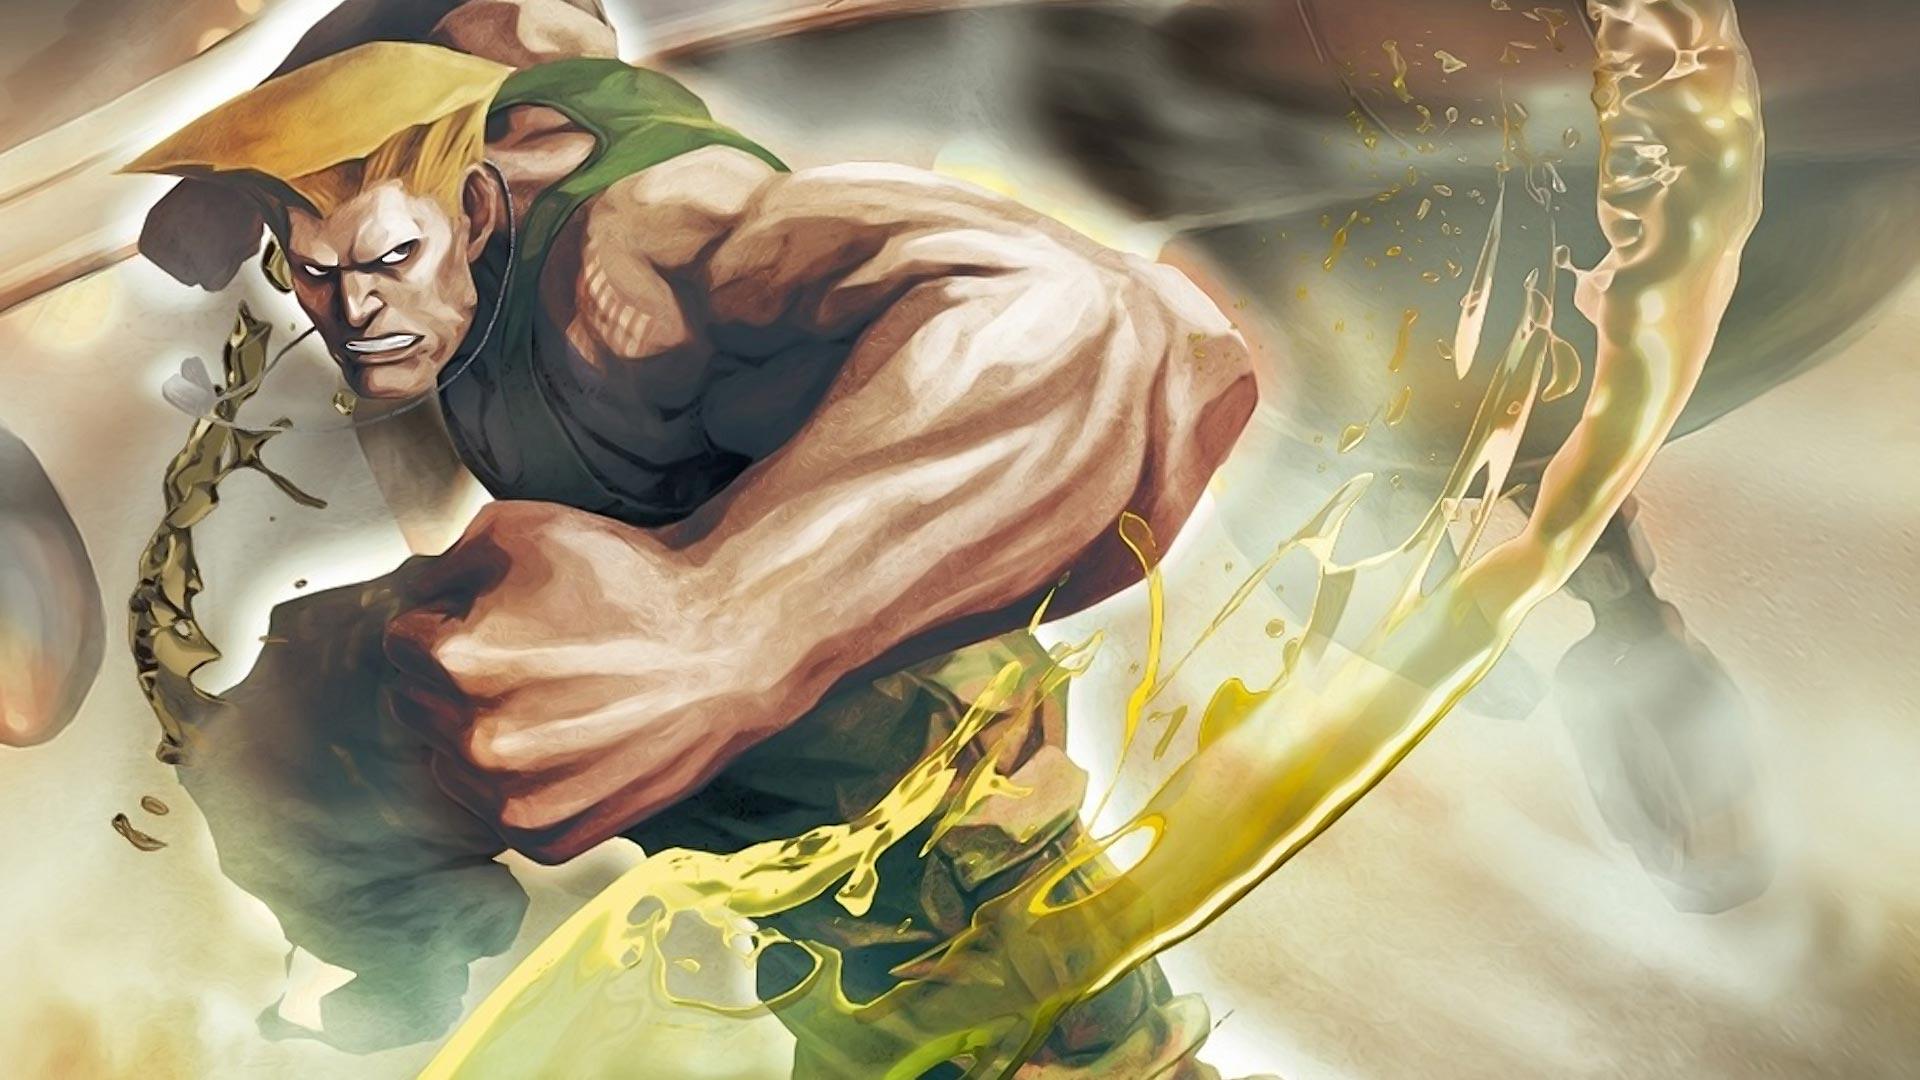 Street Fighter X Tekken HD Wallpaper | Background Image ...